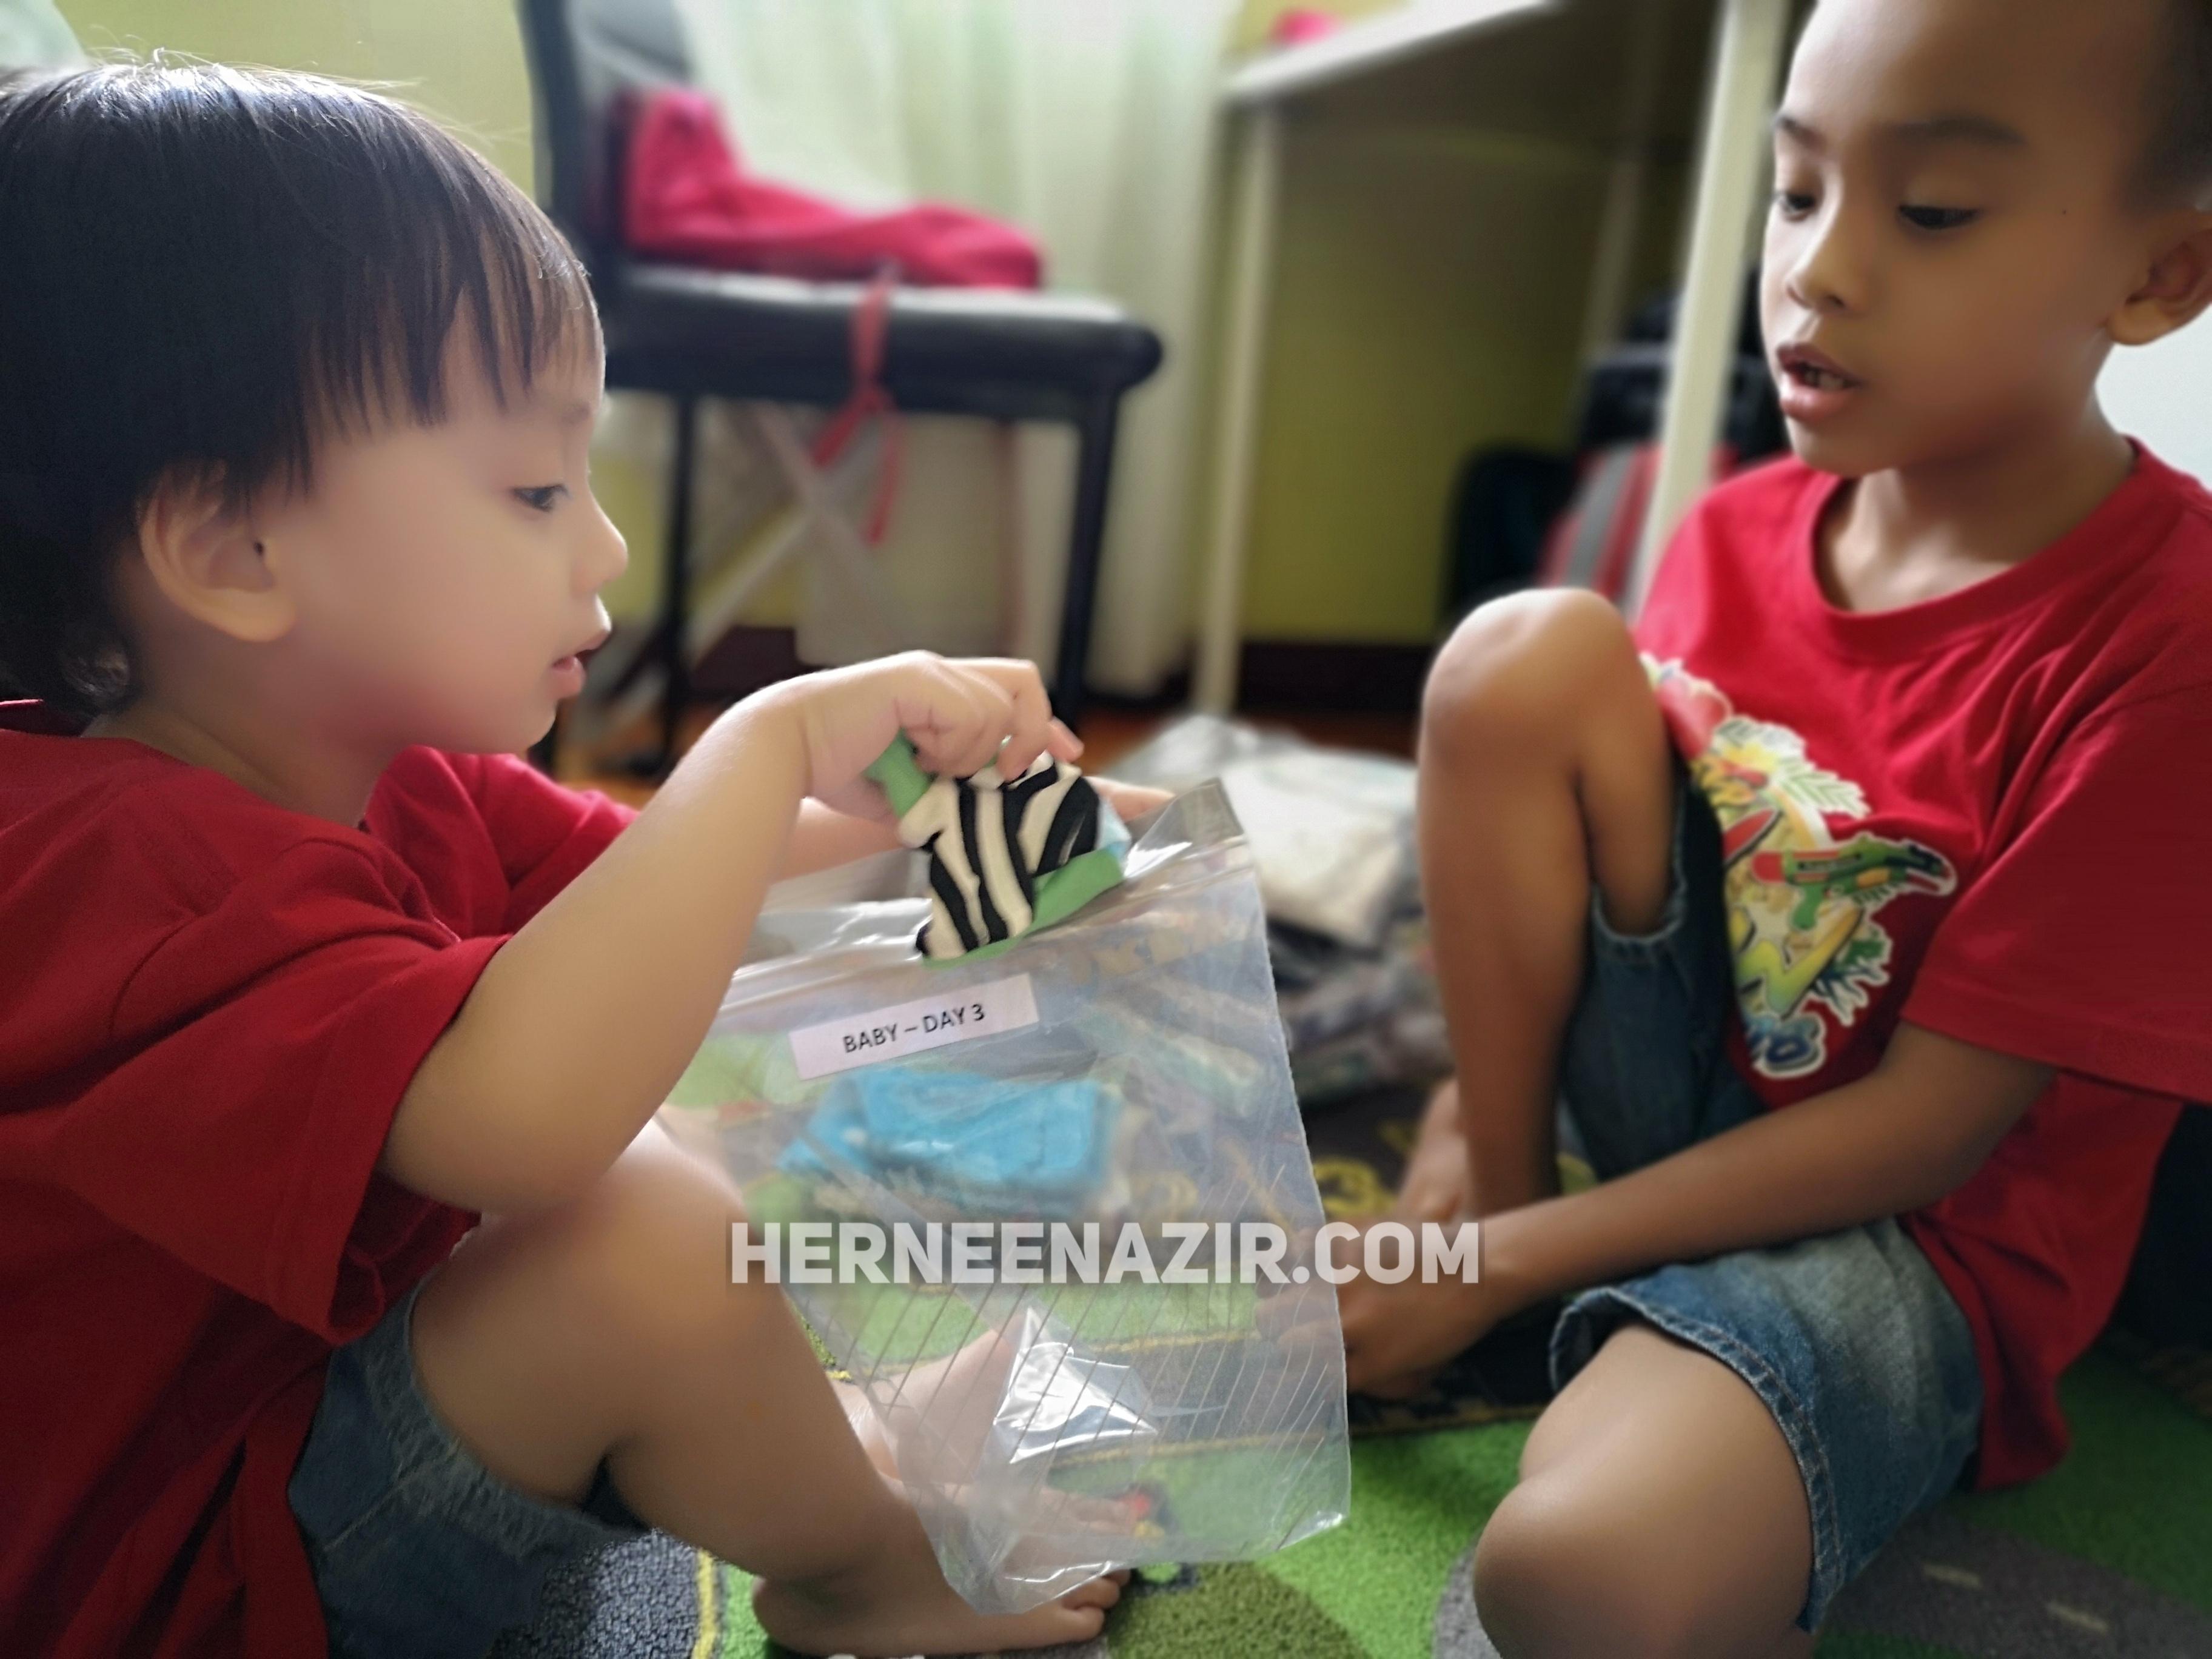 Jom Tolong Ummi Packing Baju Baby